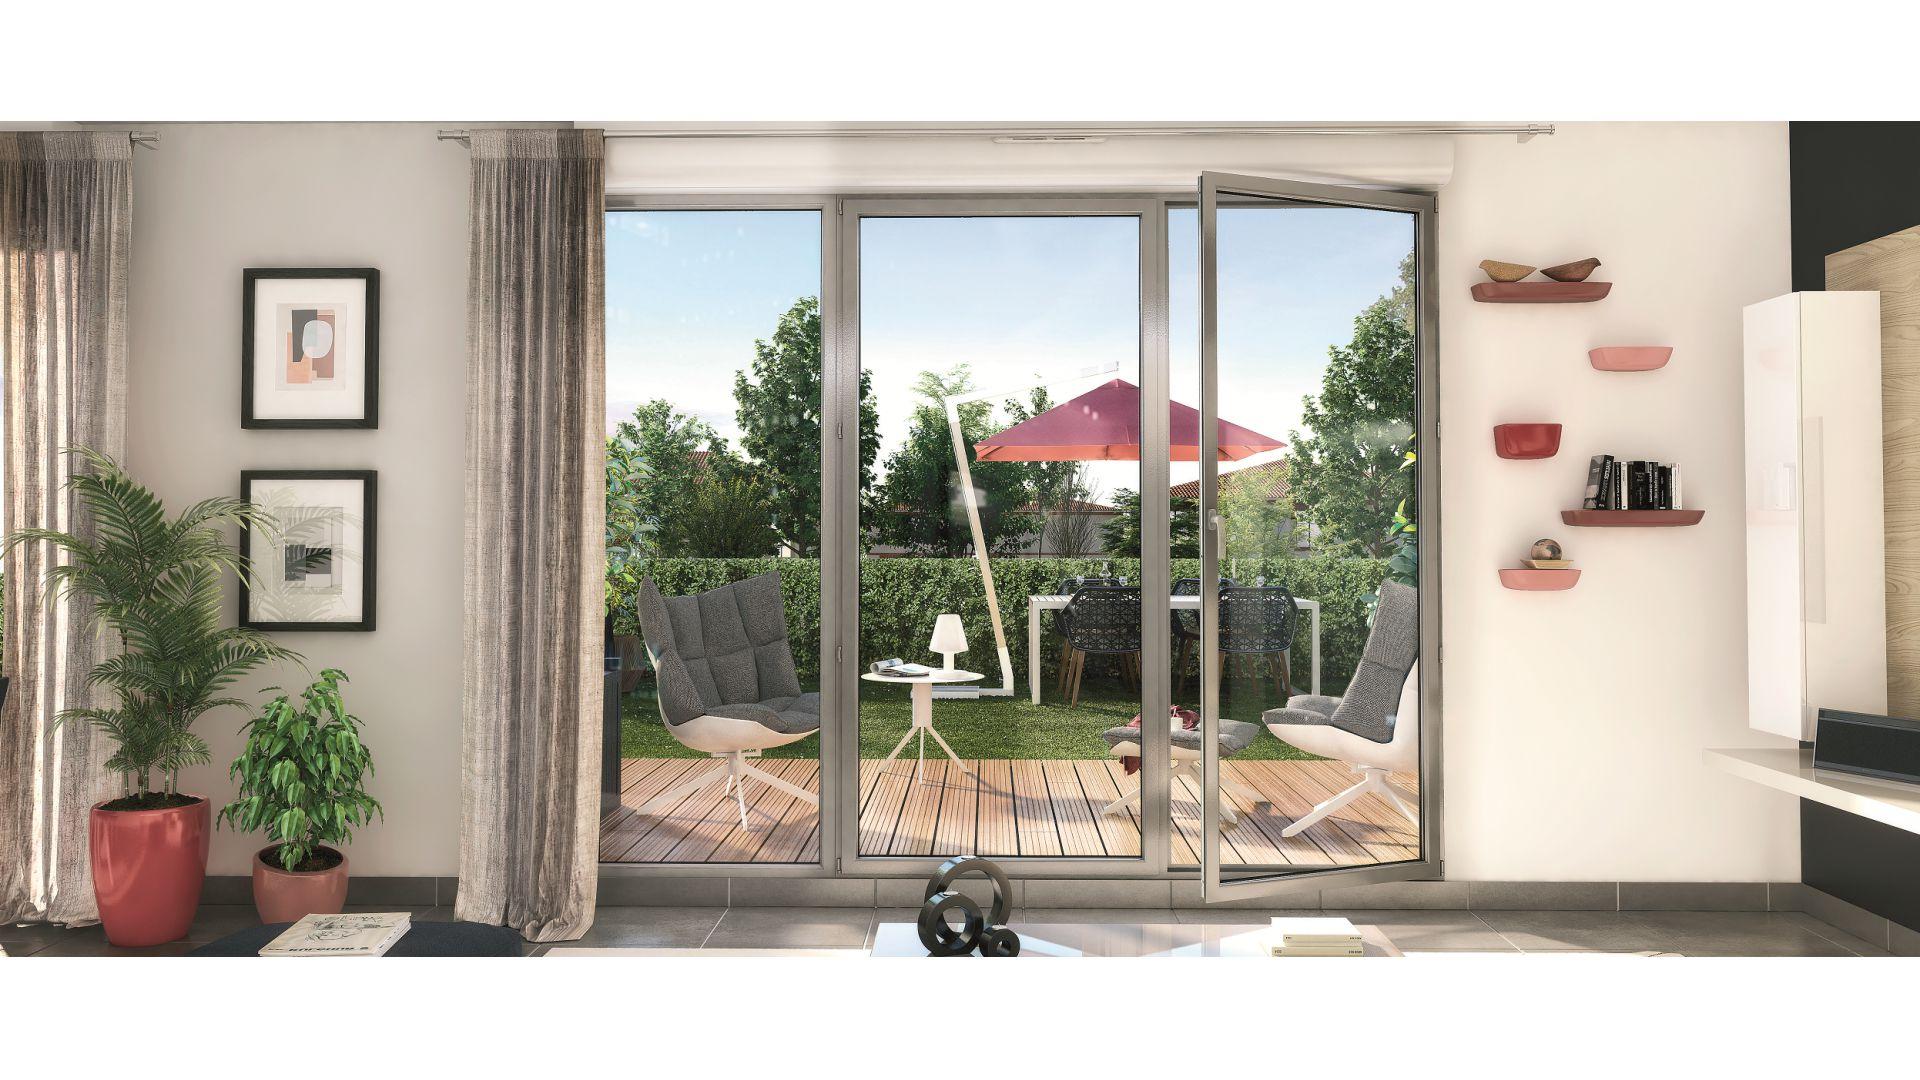 GreenCity immobilier - Toulouse rue des Fontaines - 31300 - résidence Villa Patricia - appartement T2 - T3 - T4 - T5 - vue terrasse